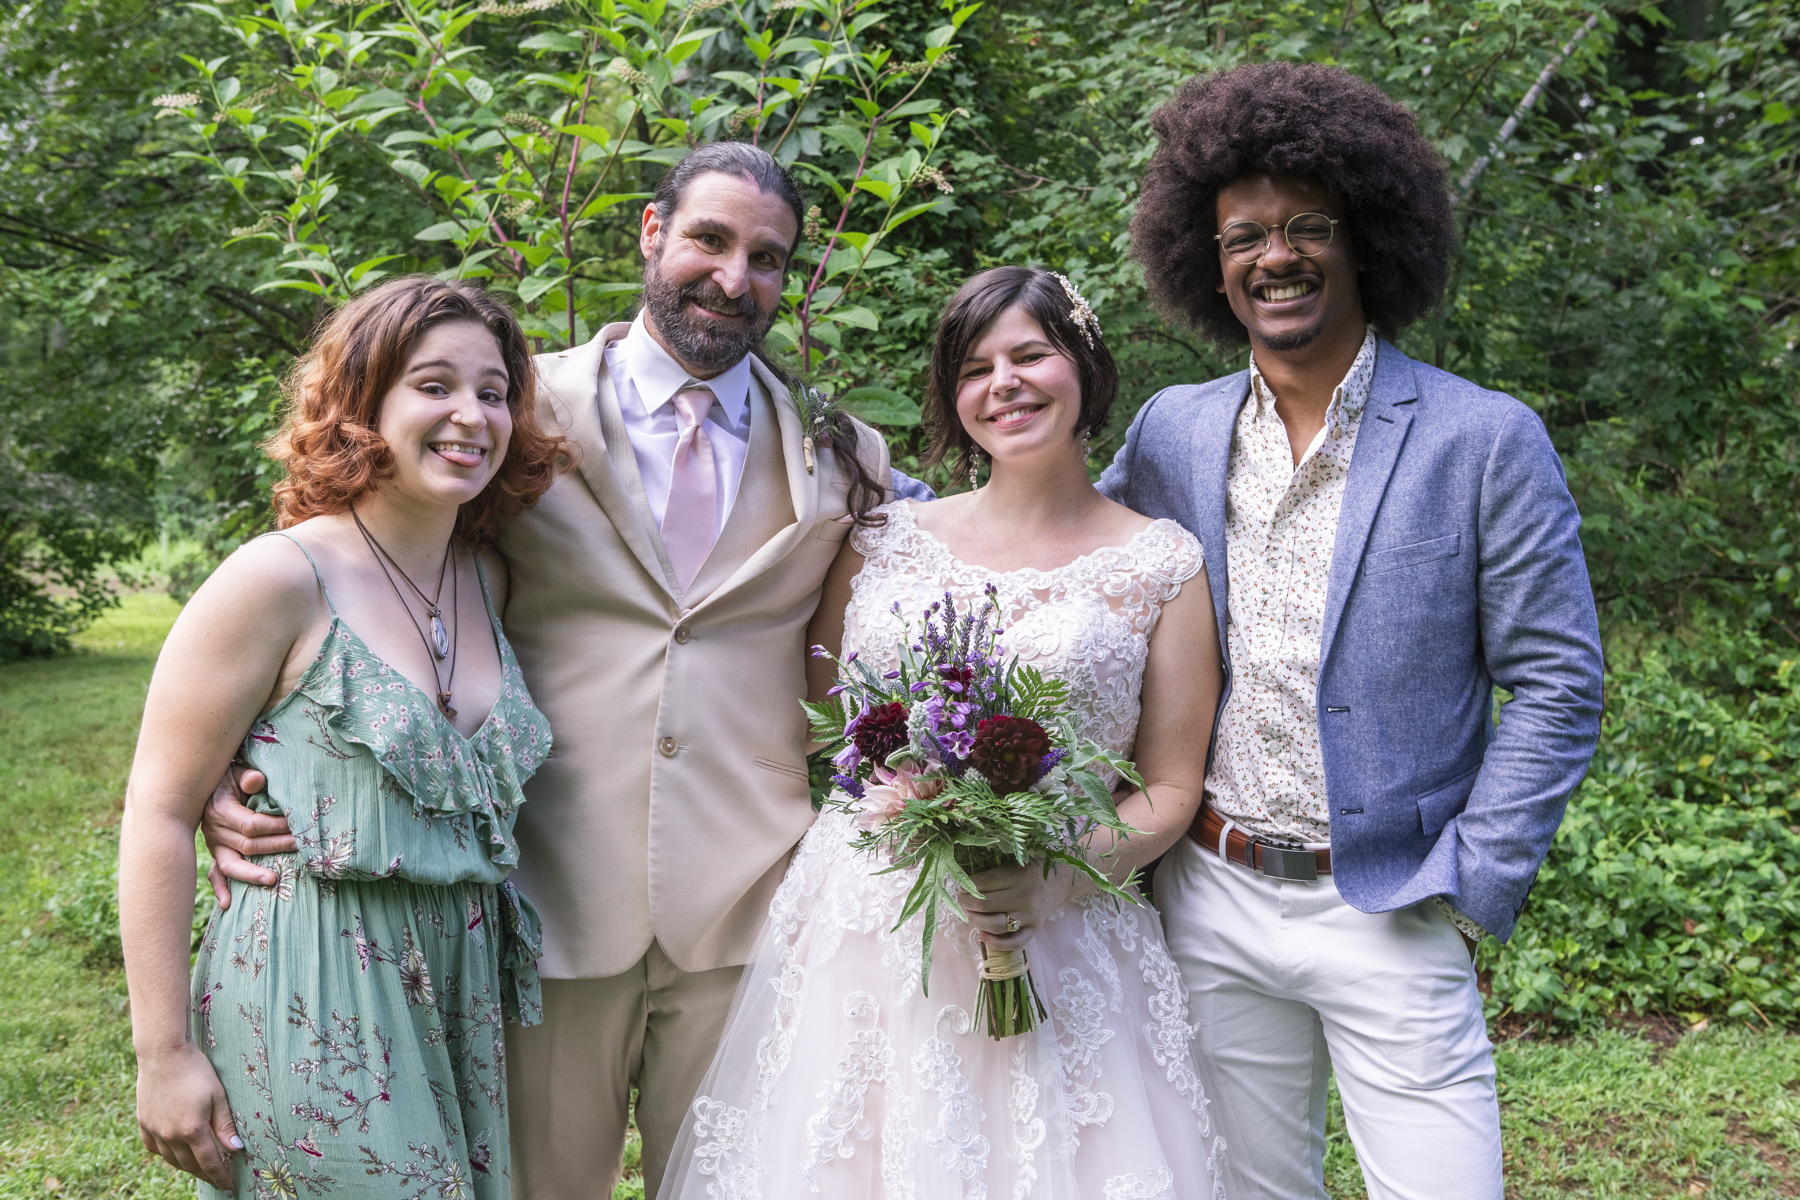 Avyanna and Phoenix Wedding 2019_photos by Studio Misha_BLOG-112.jpg